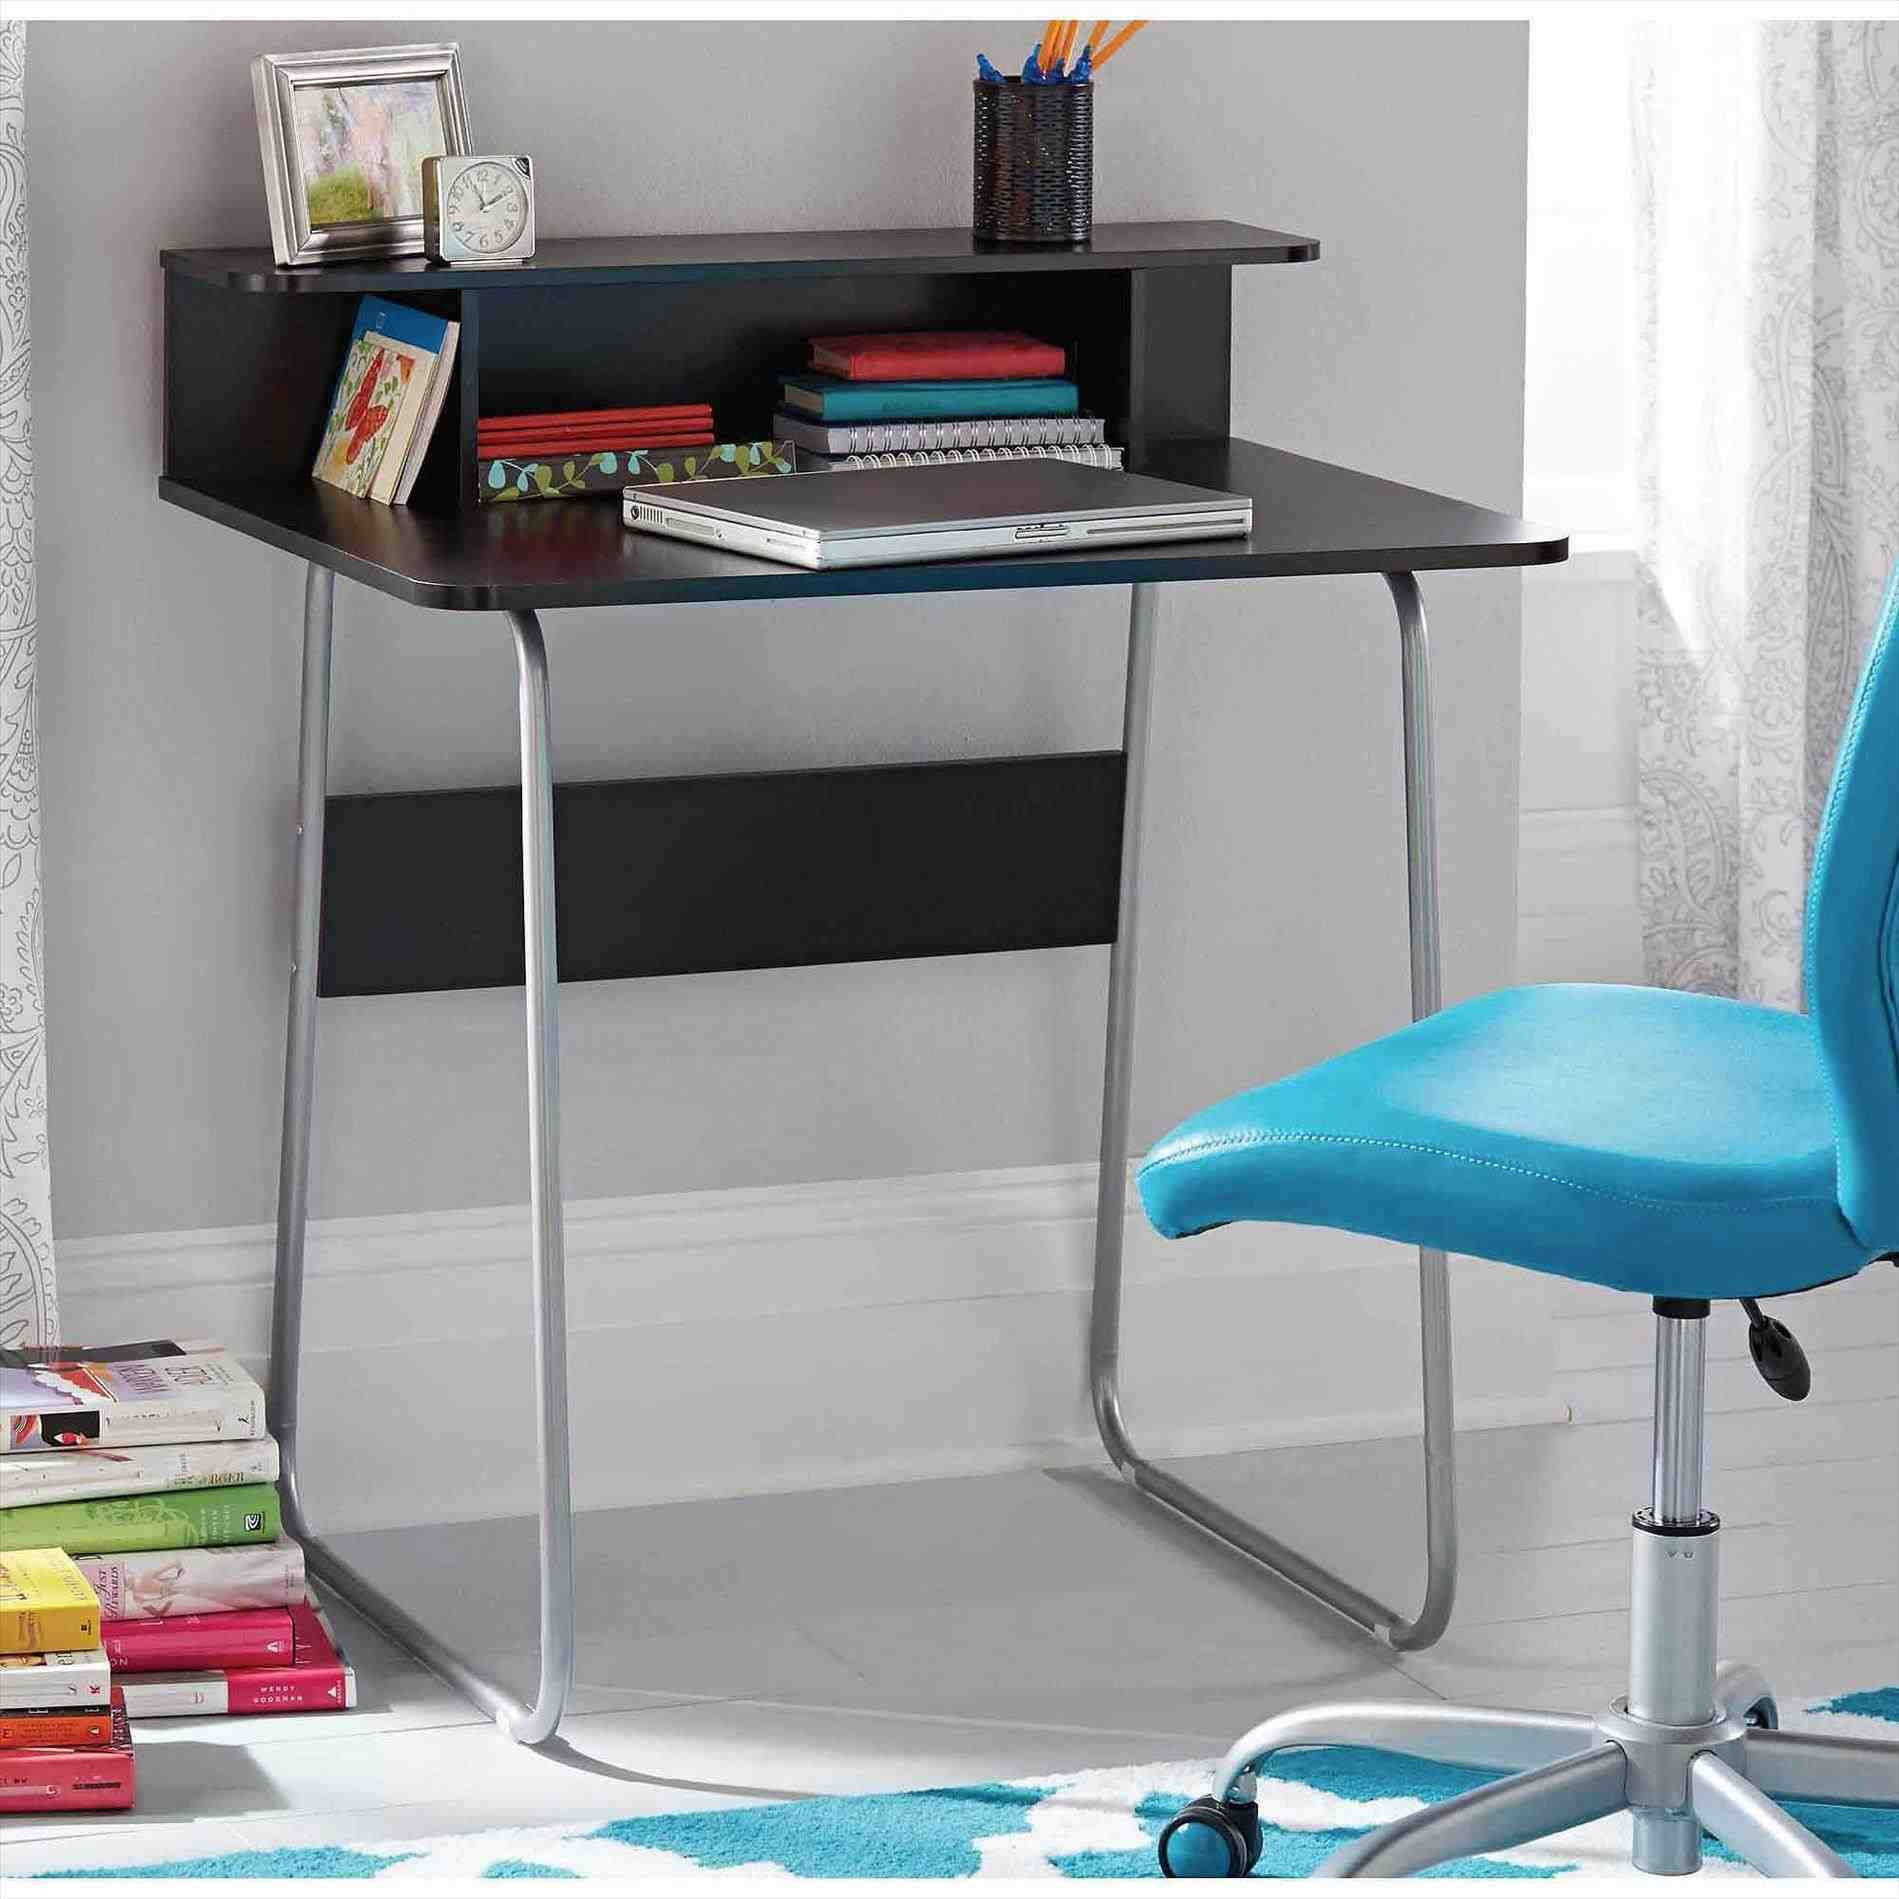 Cheap Office Chairs Walmart Computer Desks For Home Modern Computer Desk Computer Desk With Shelves